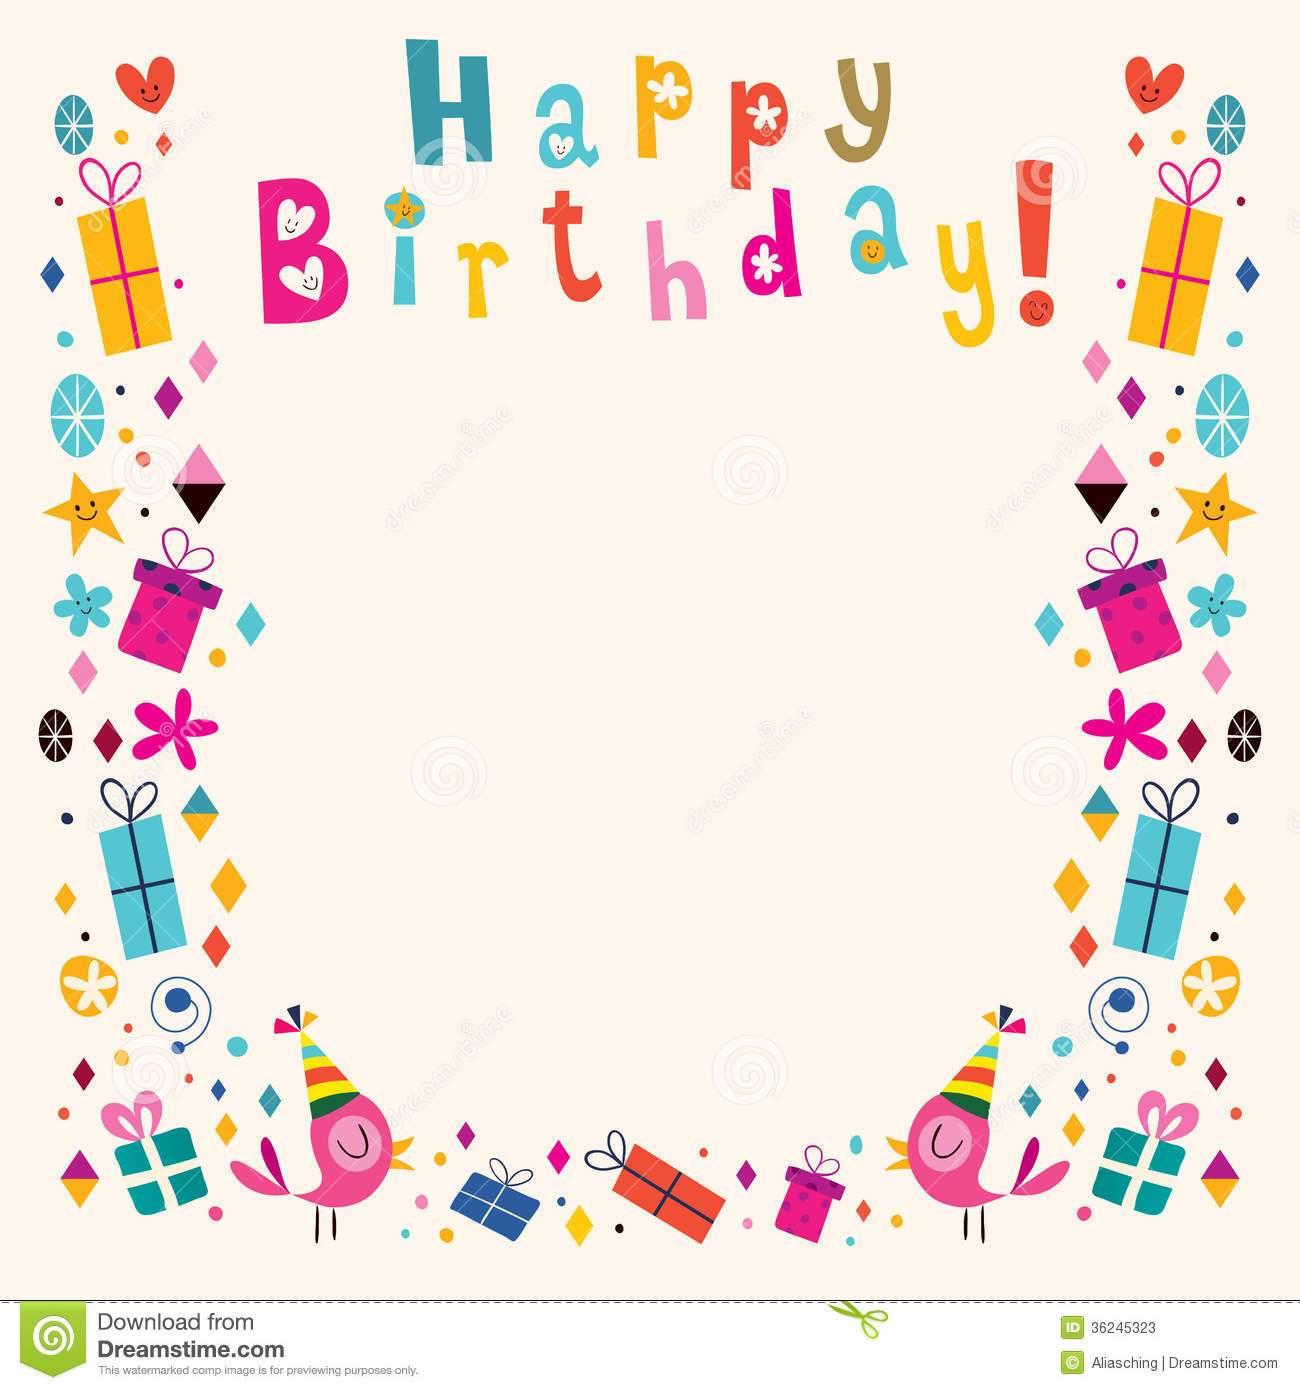 Happy birthday frame clipart 3 » Clipart Portal.